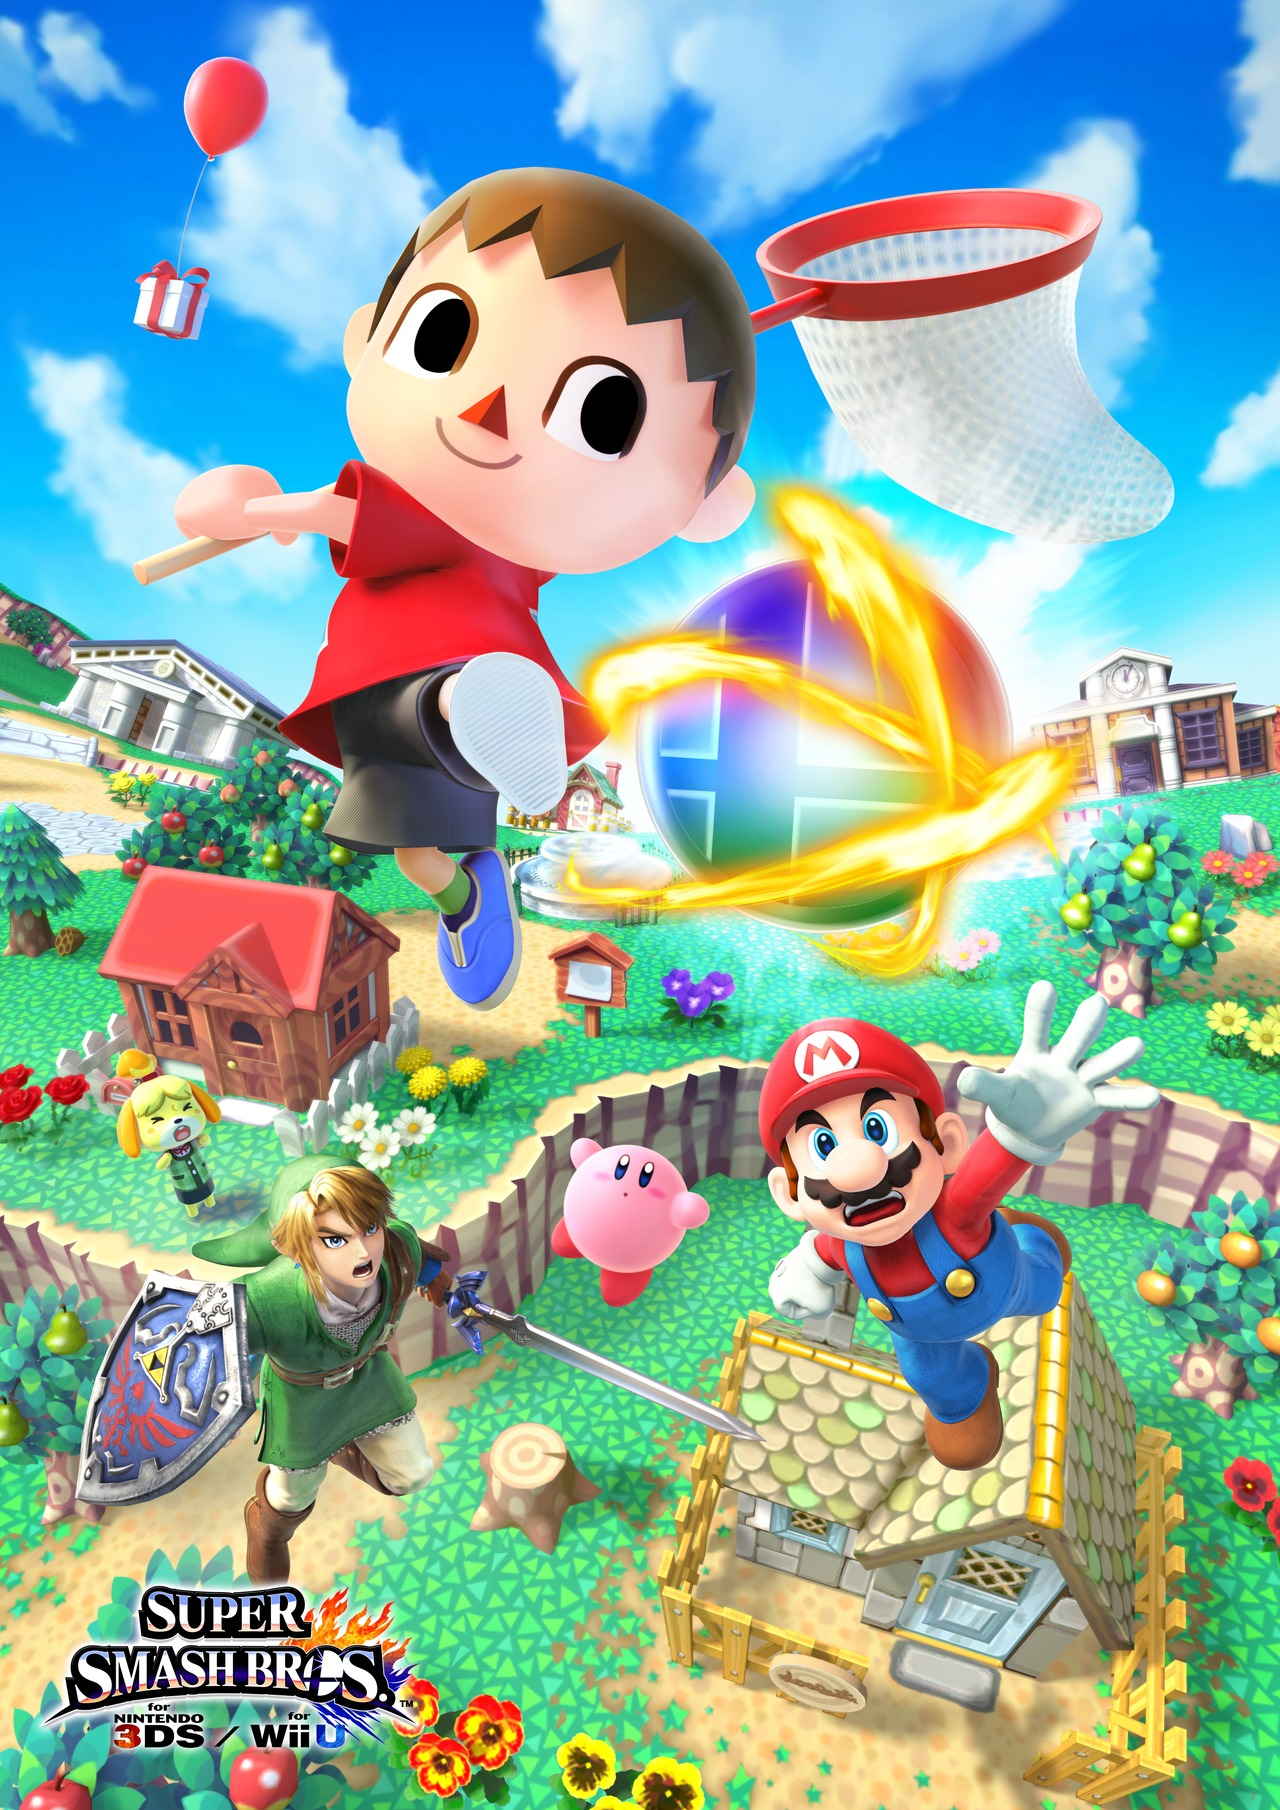 Super Smash Bros Wii U/3DS Super-smash-bros-wii-u-wii-u-wiiu-1370981490-104